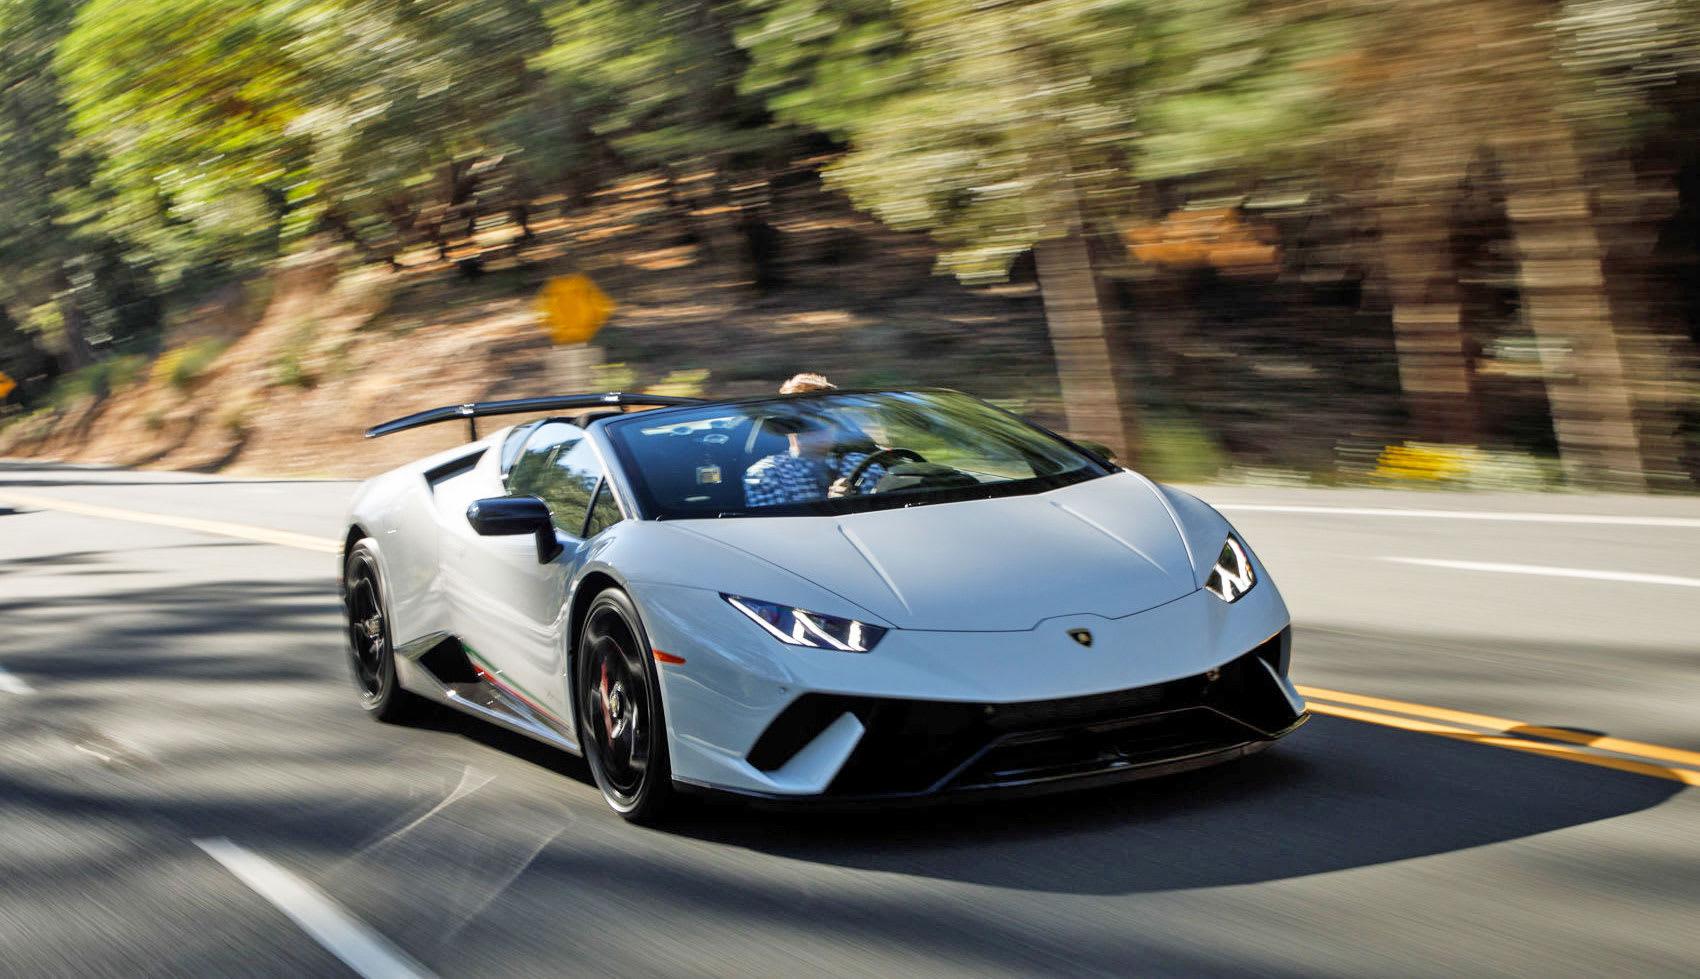 Lamborghini S High Performance Spyder Turns Physics Into Fun